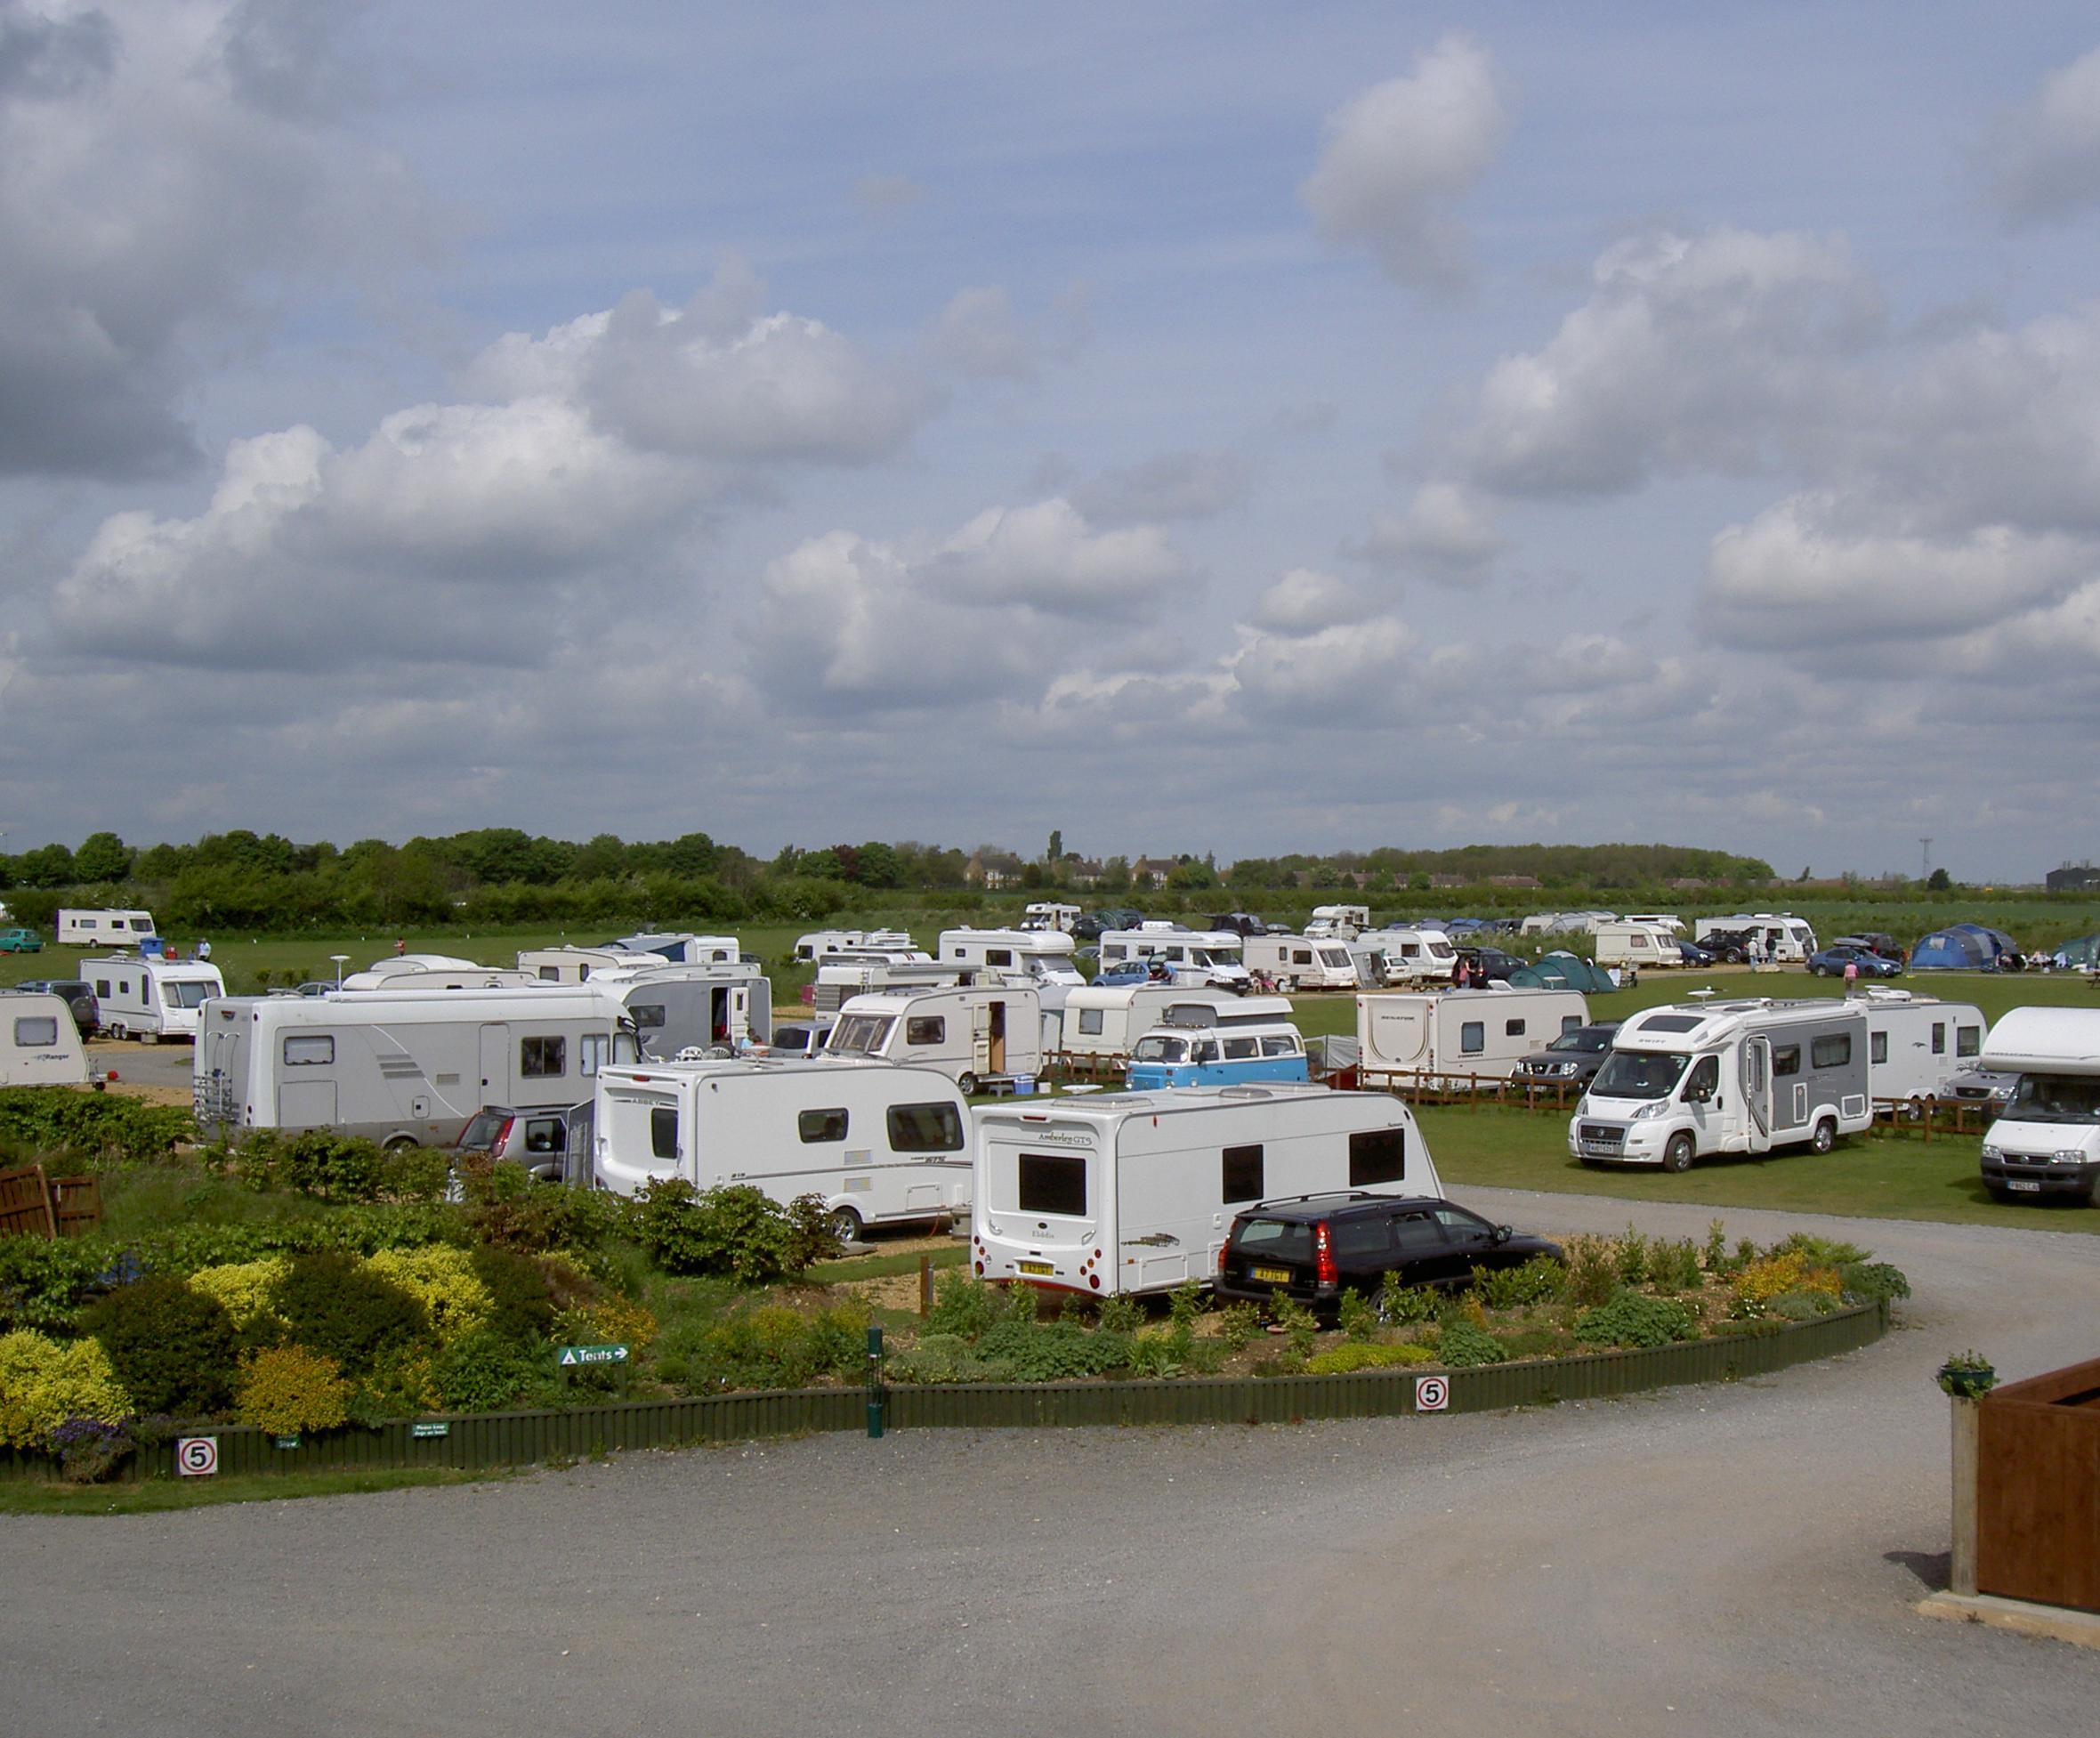 Rutland Caravan and Camping, Greetham